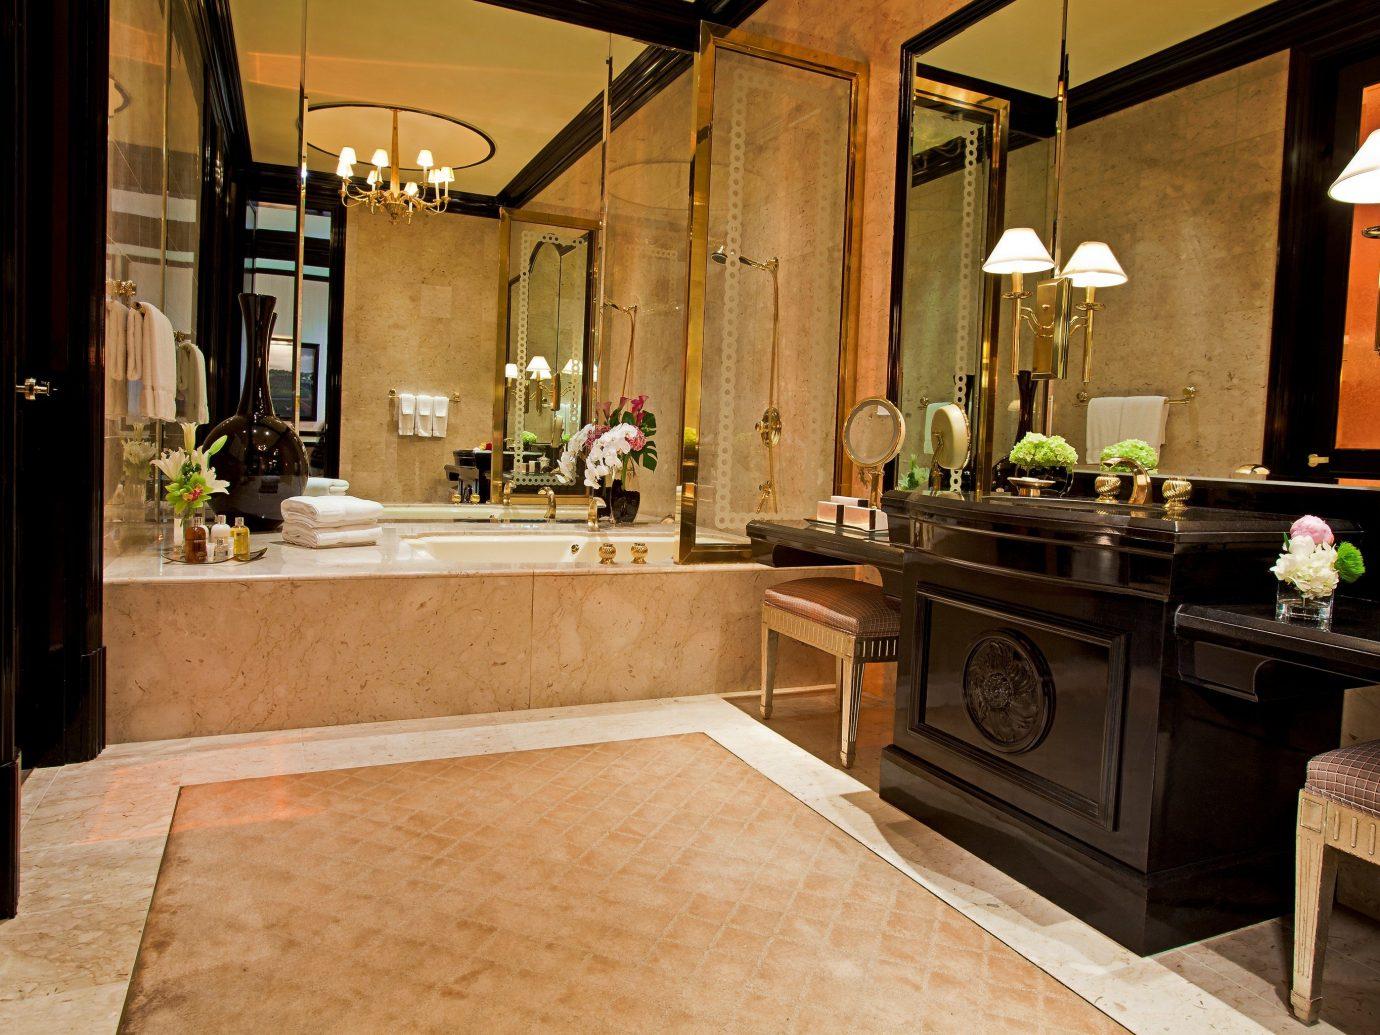 bathroom in a Three-Bedroom Villa at The Mirage Resort & Casino in Las Vegas